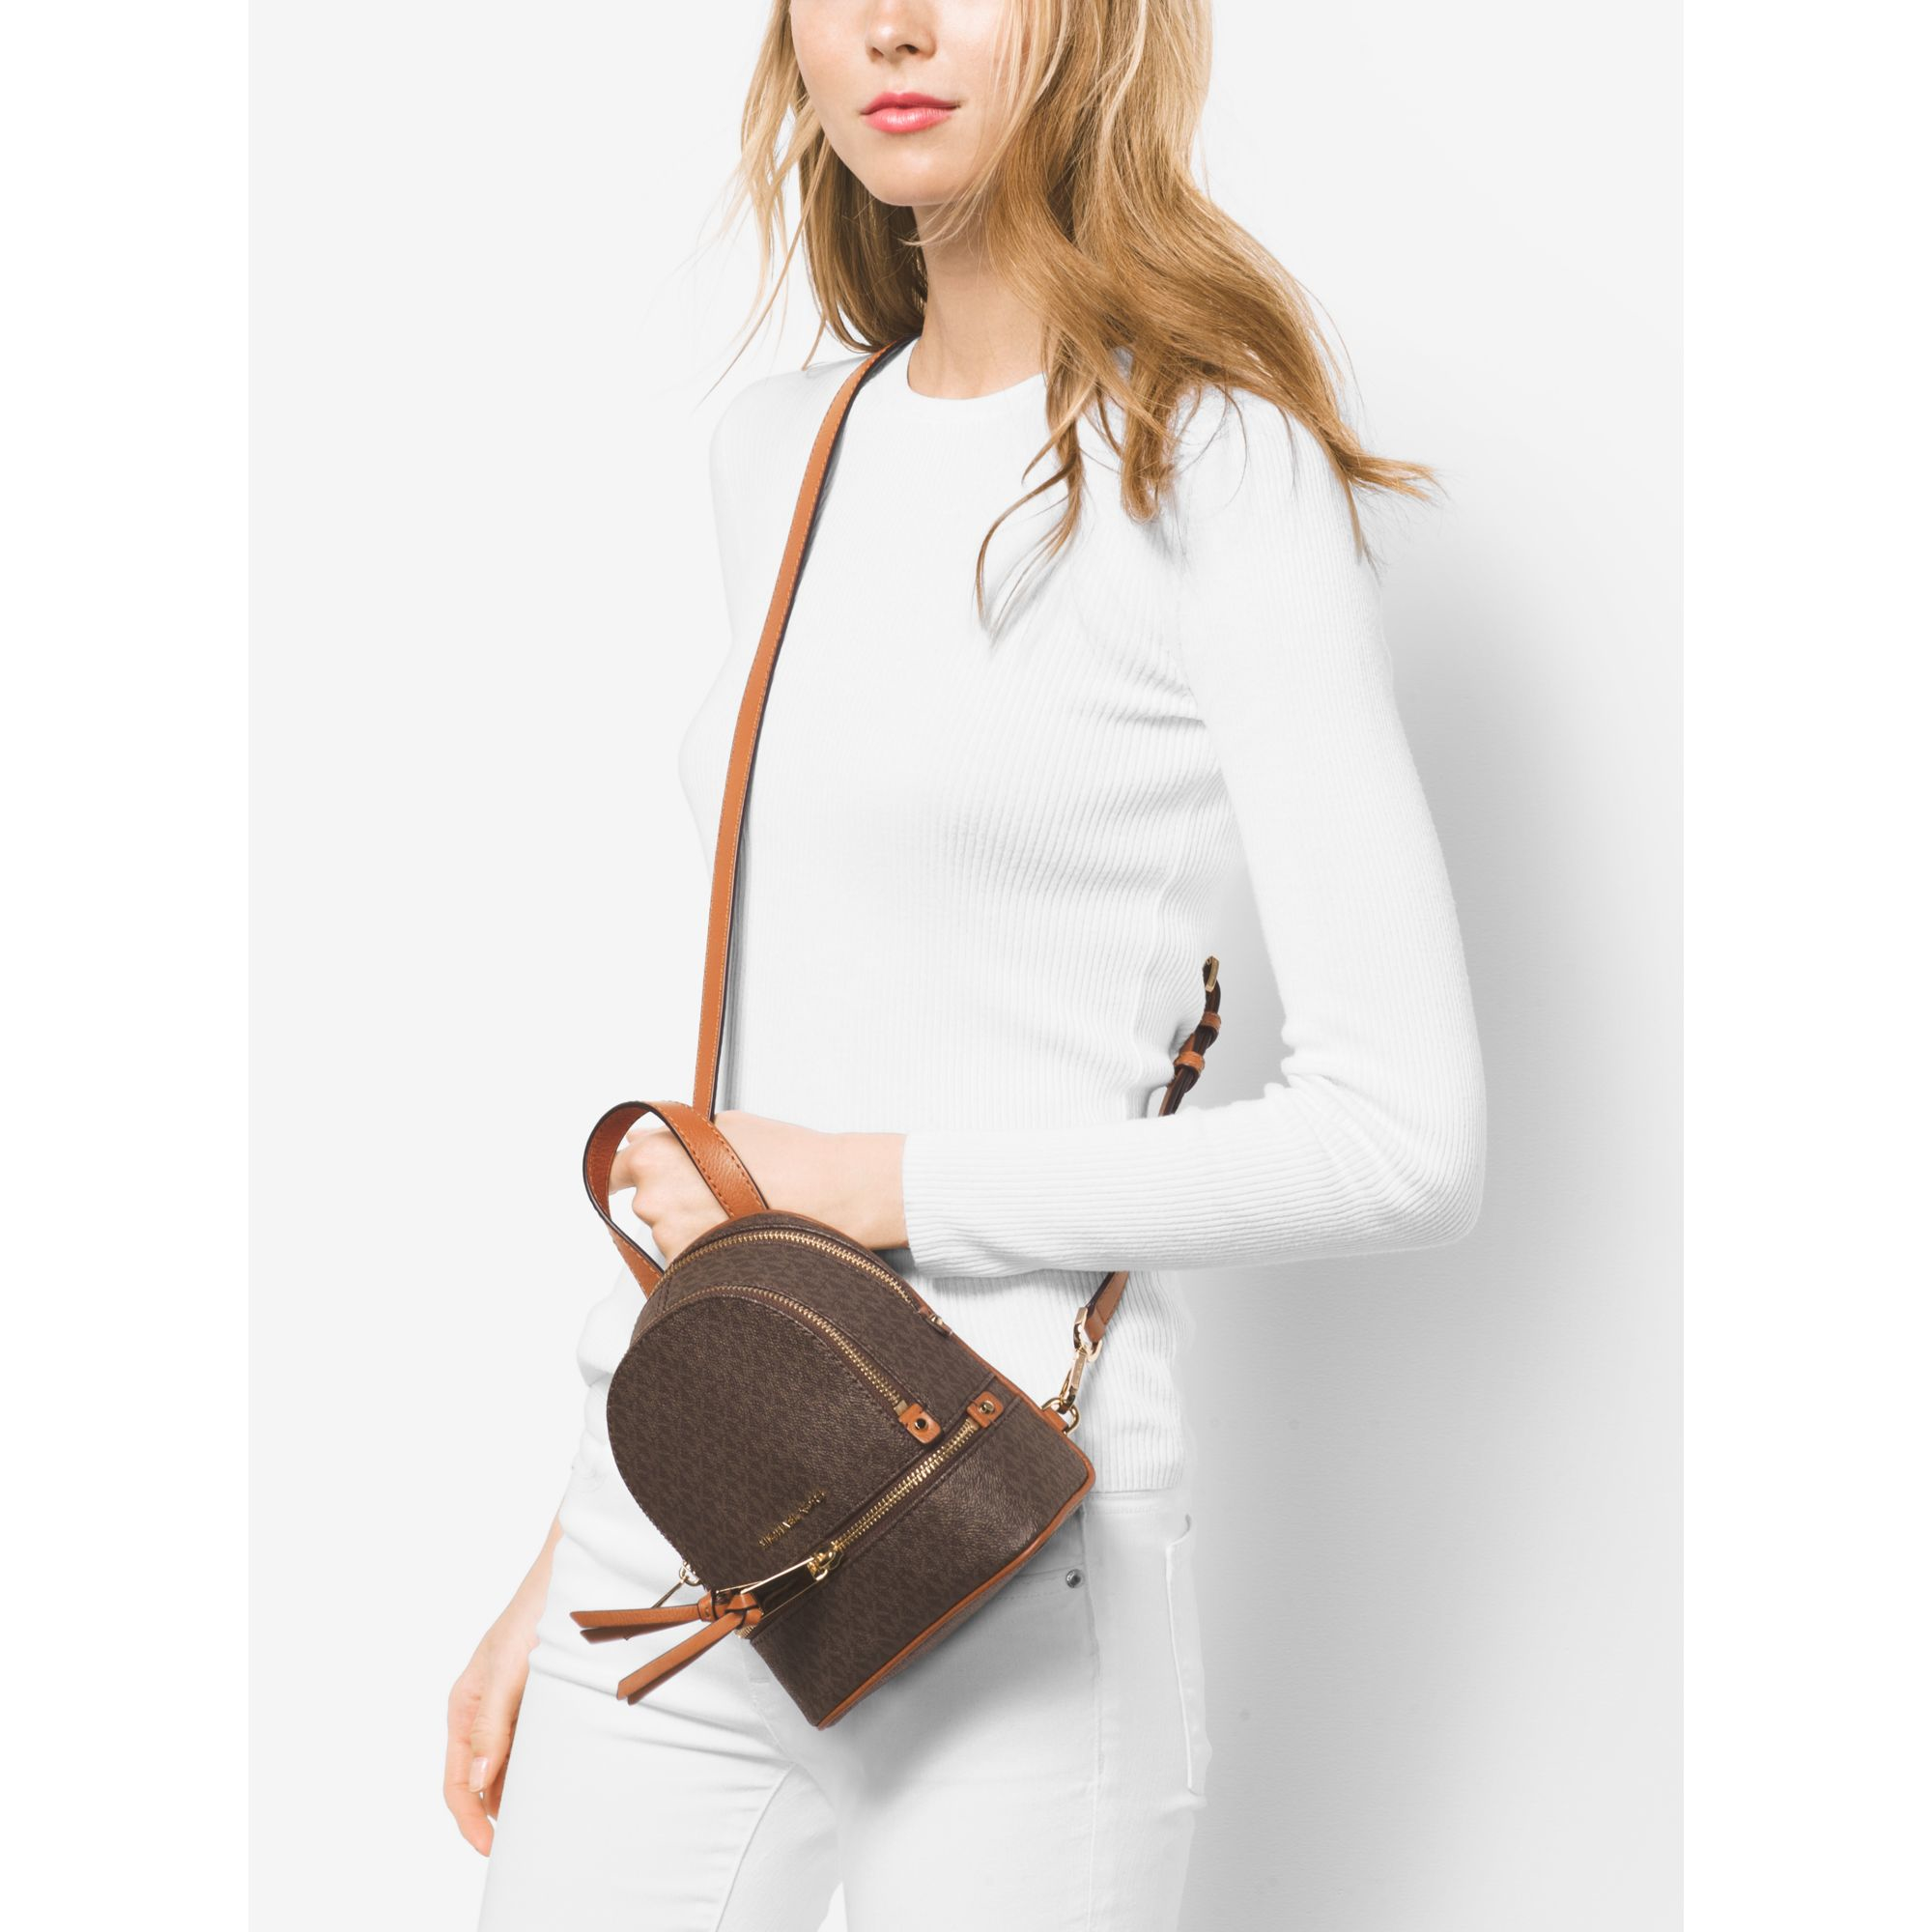 eae61f25716f Michael Kors Rhea Extra-small Logo Backpack in Brown - Lyst